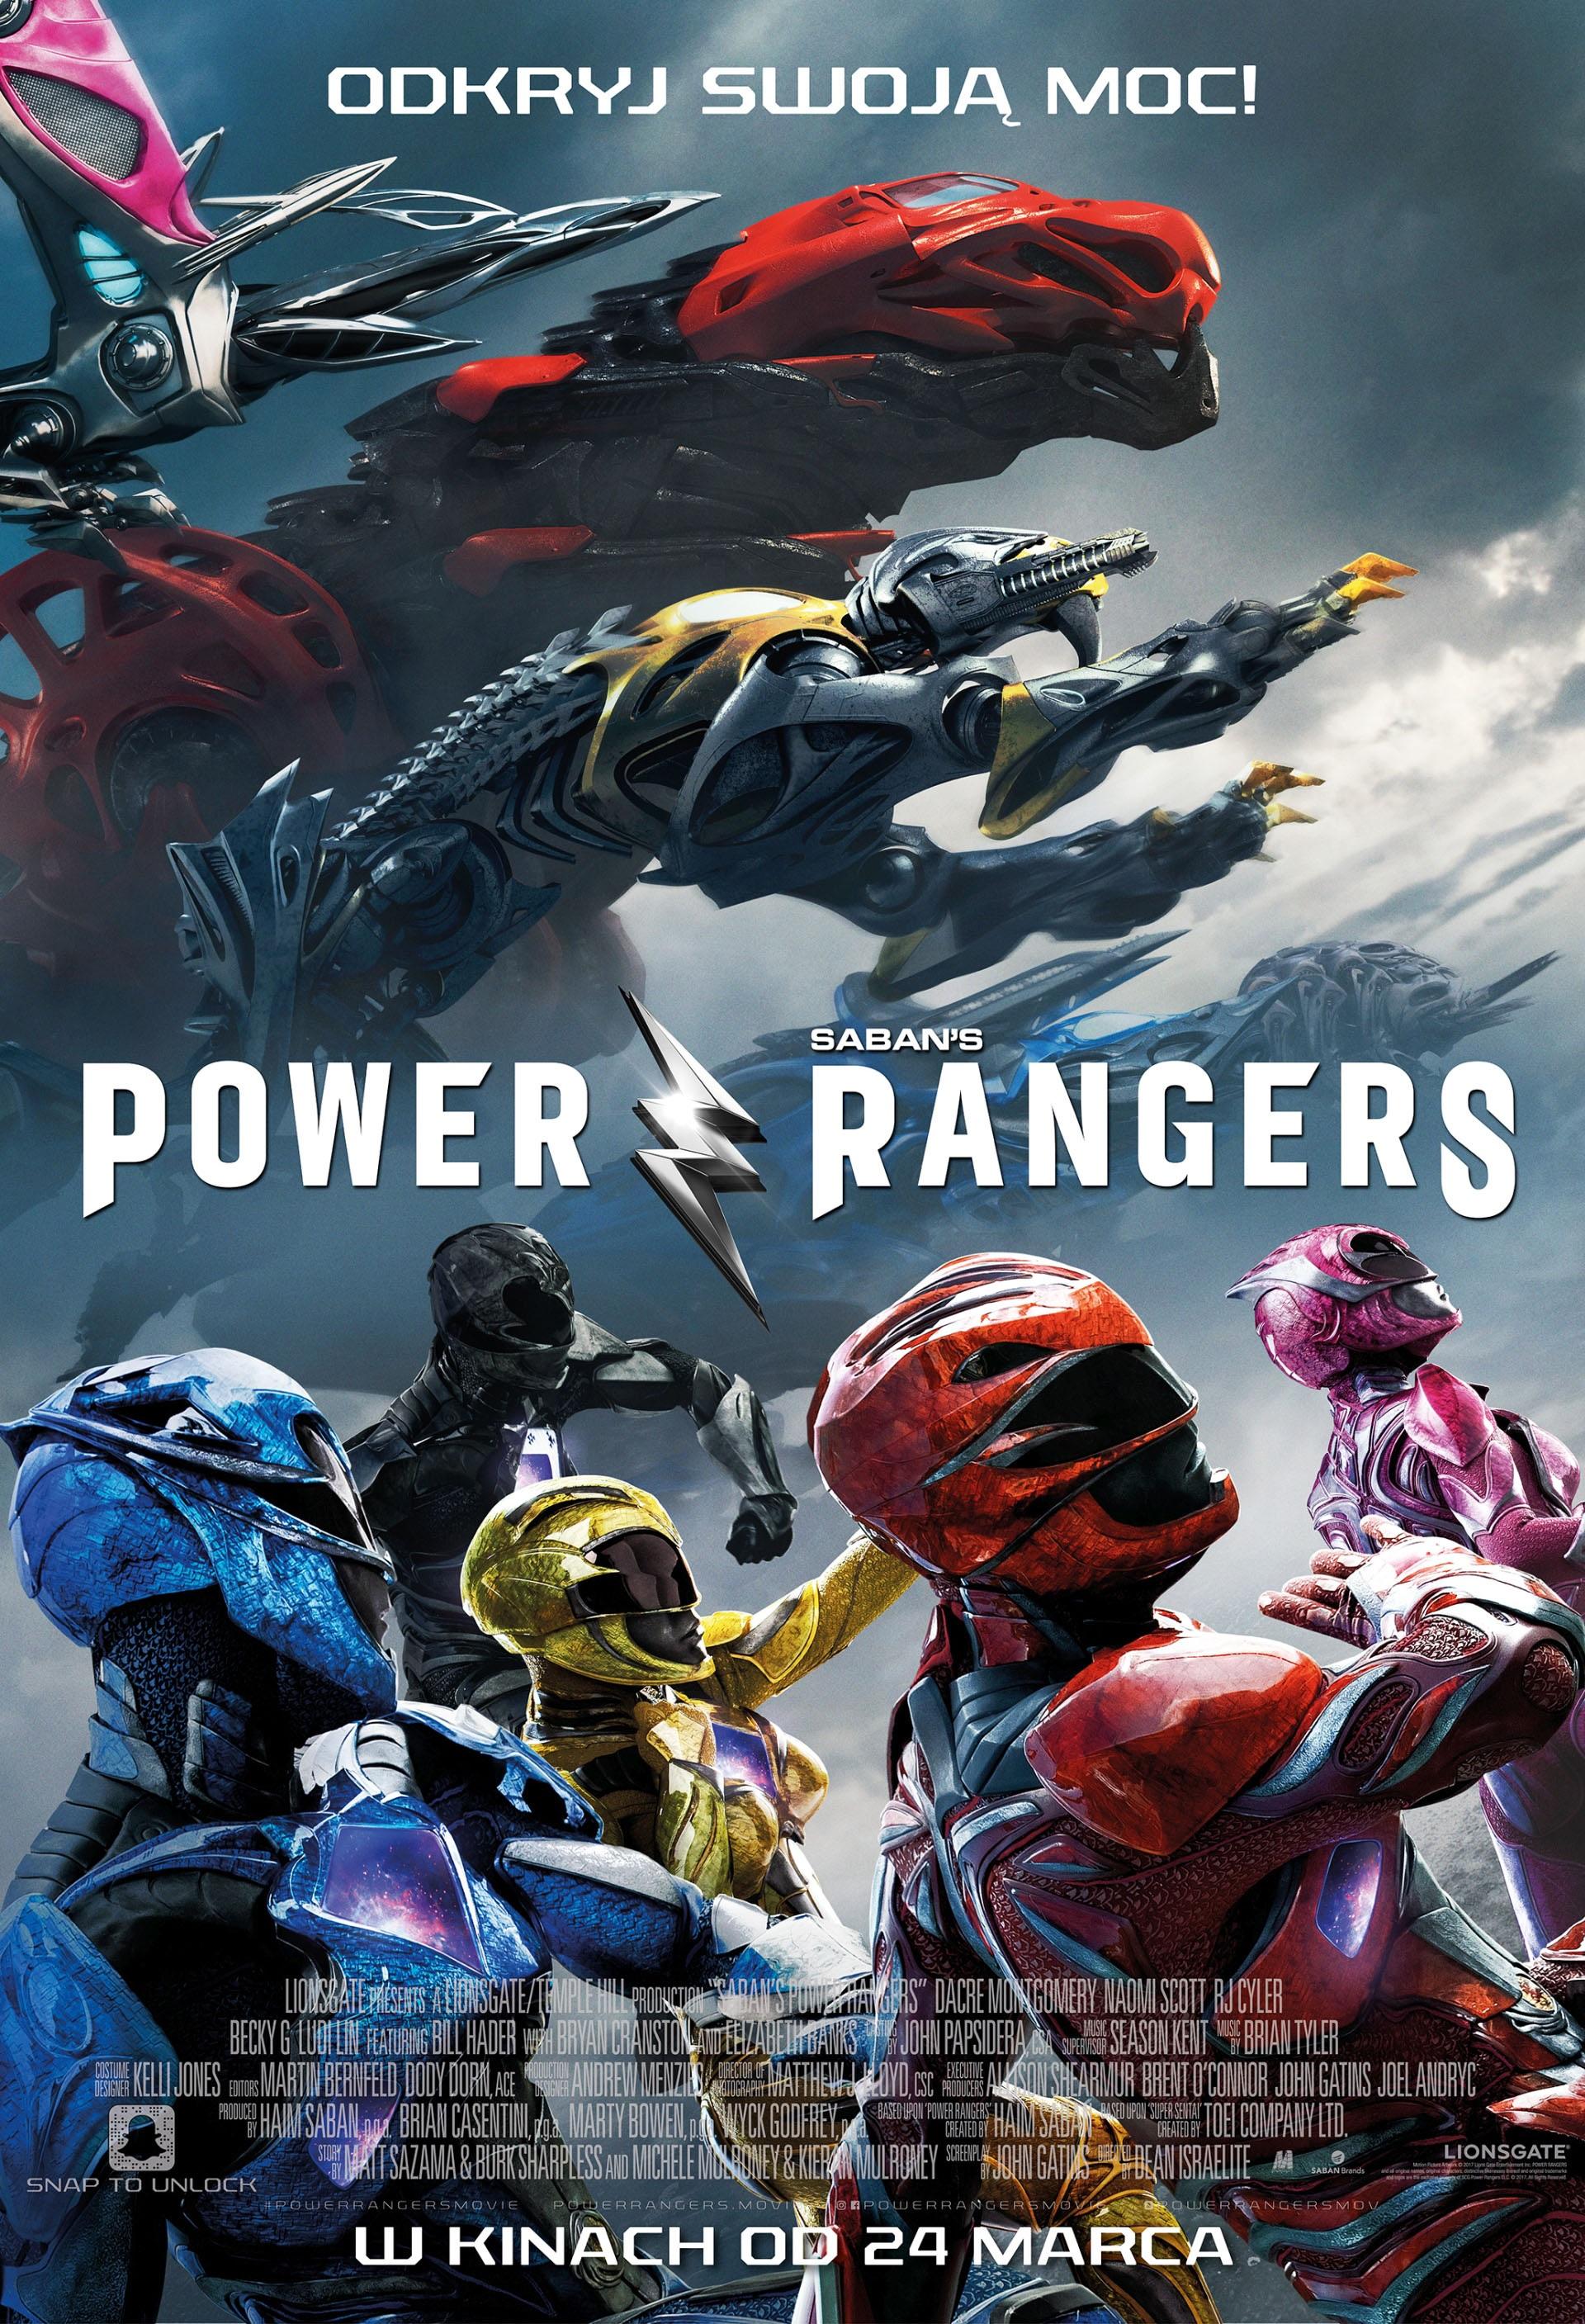 Power Rangers (film 2017)